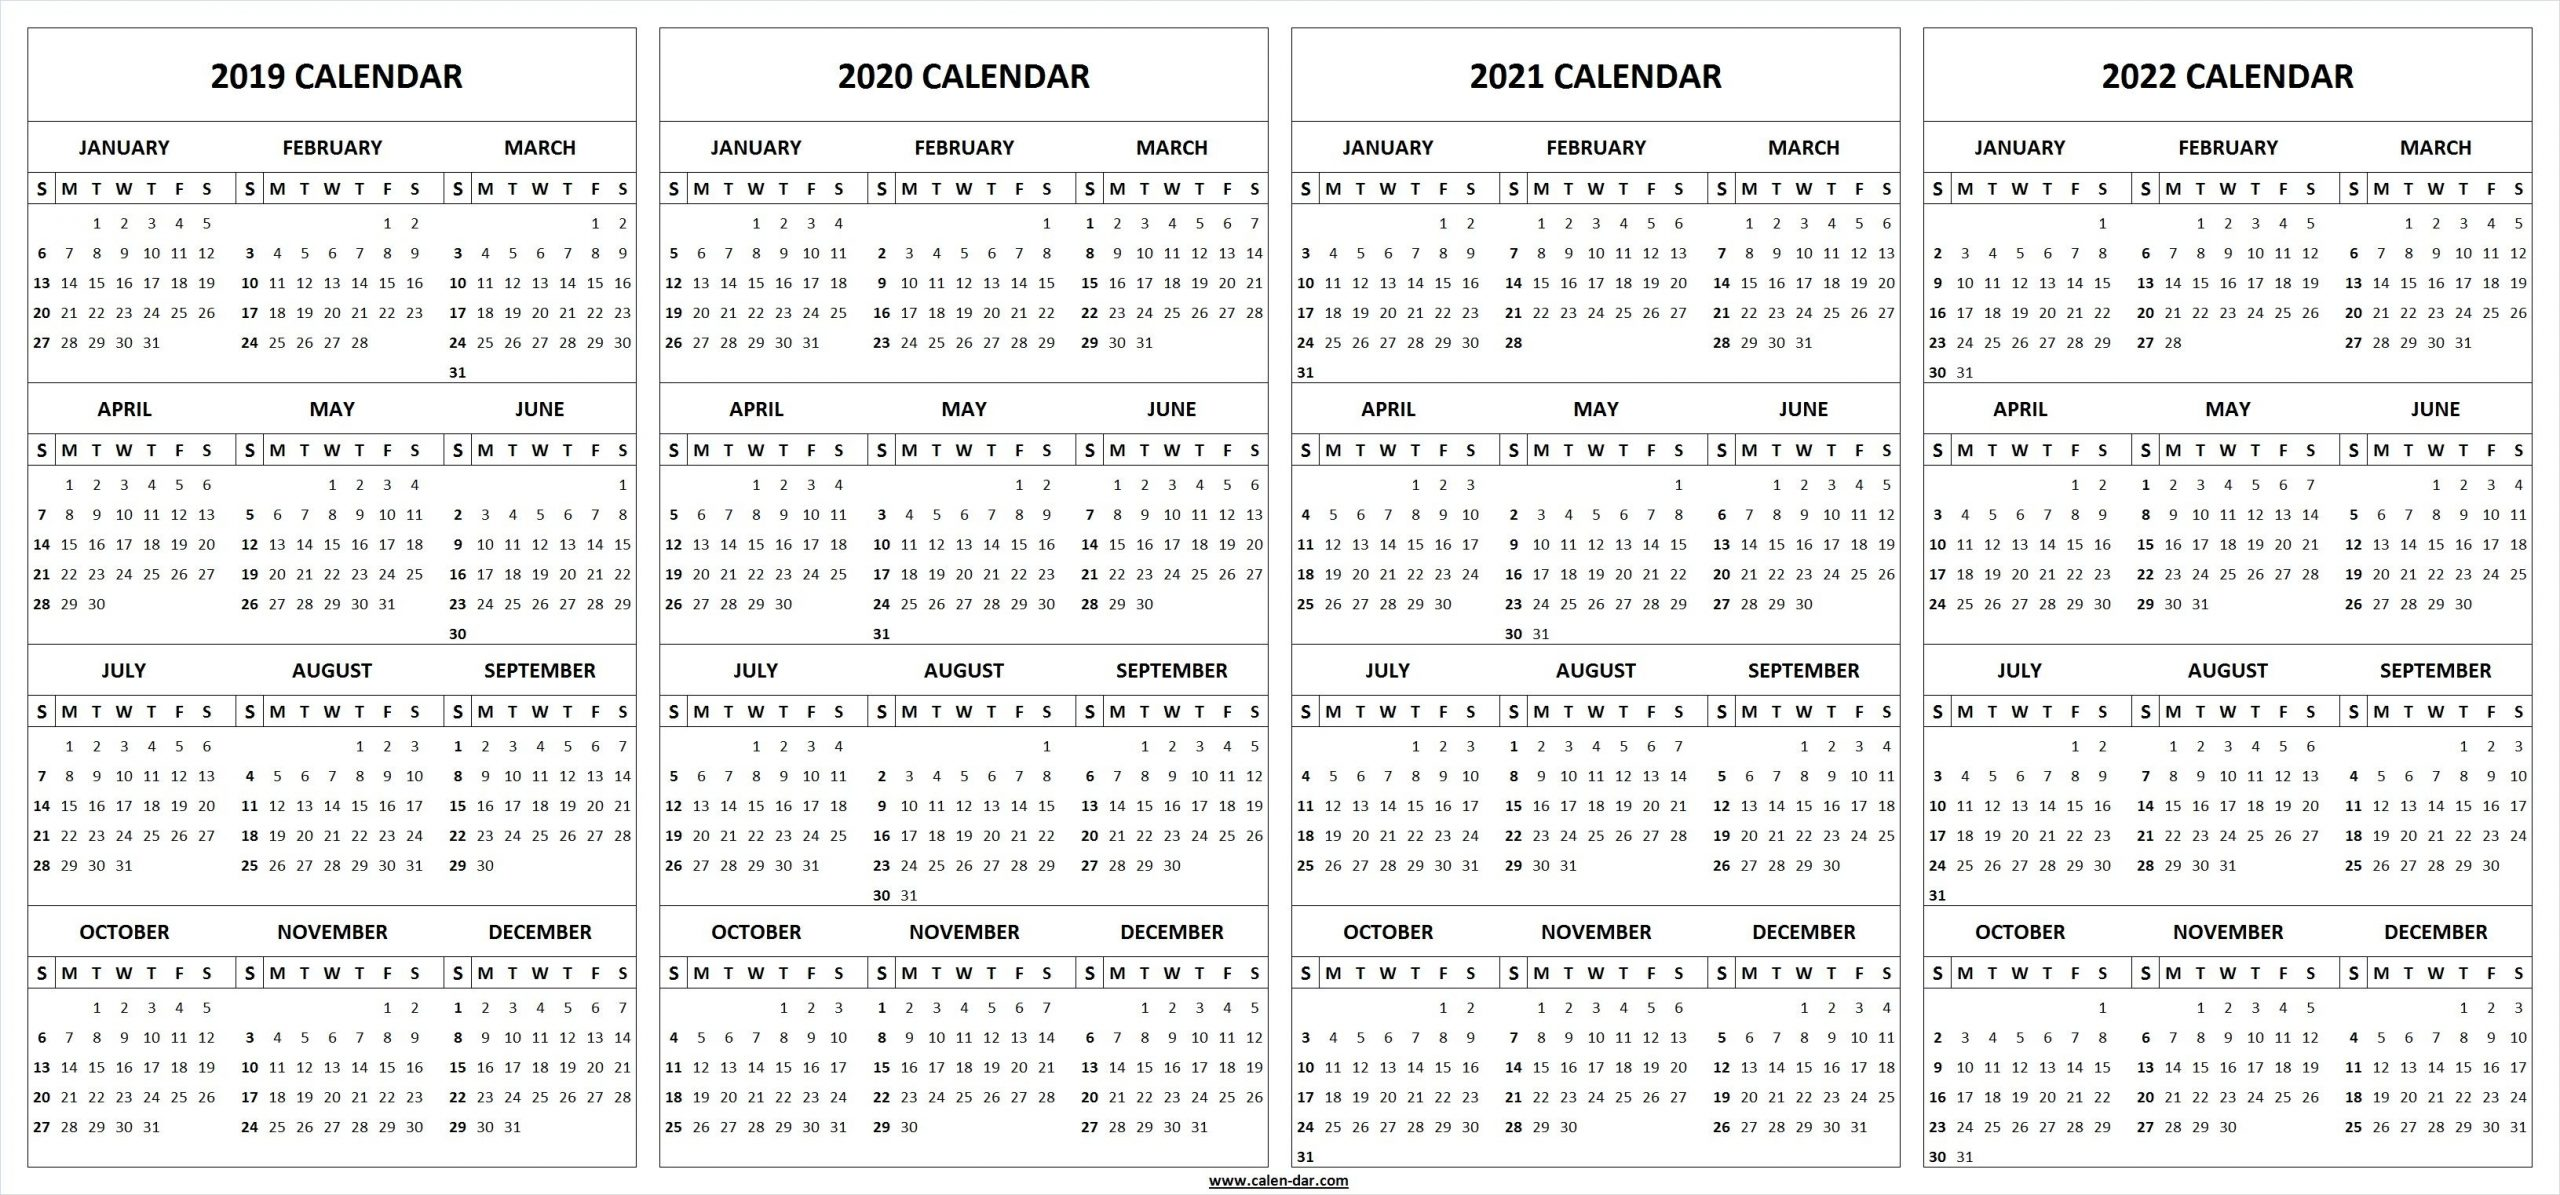 2019 2020 2021 2022 Calendar Blank Template | Calendar